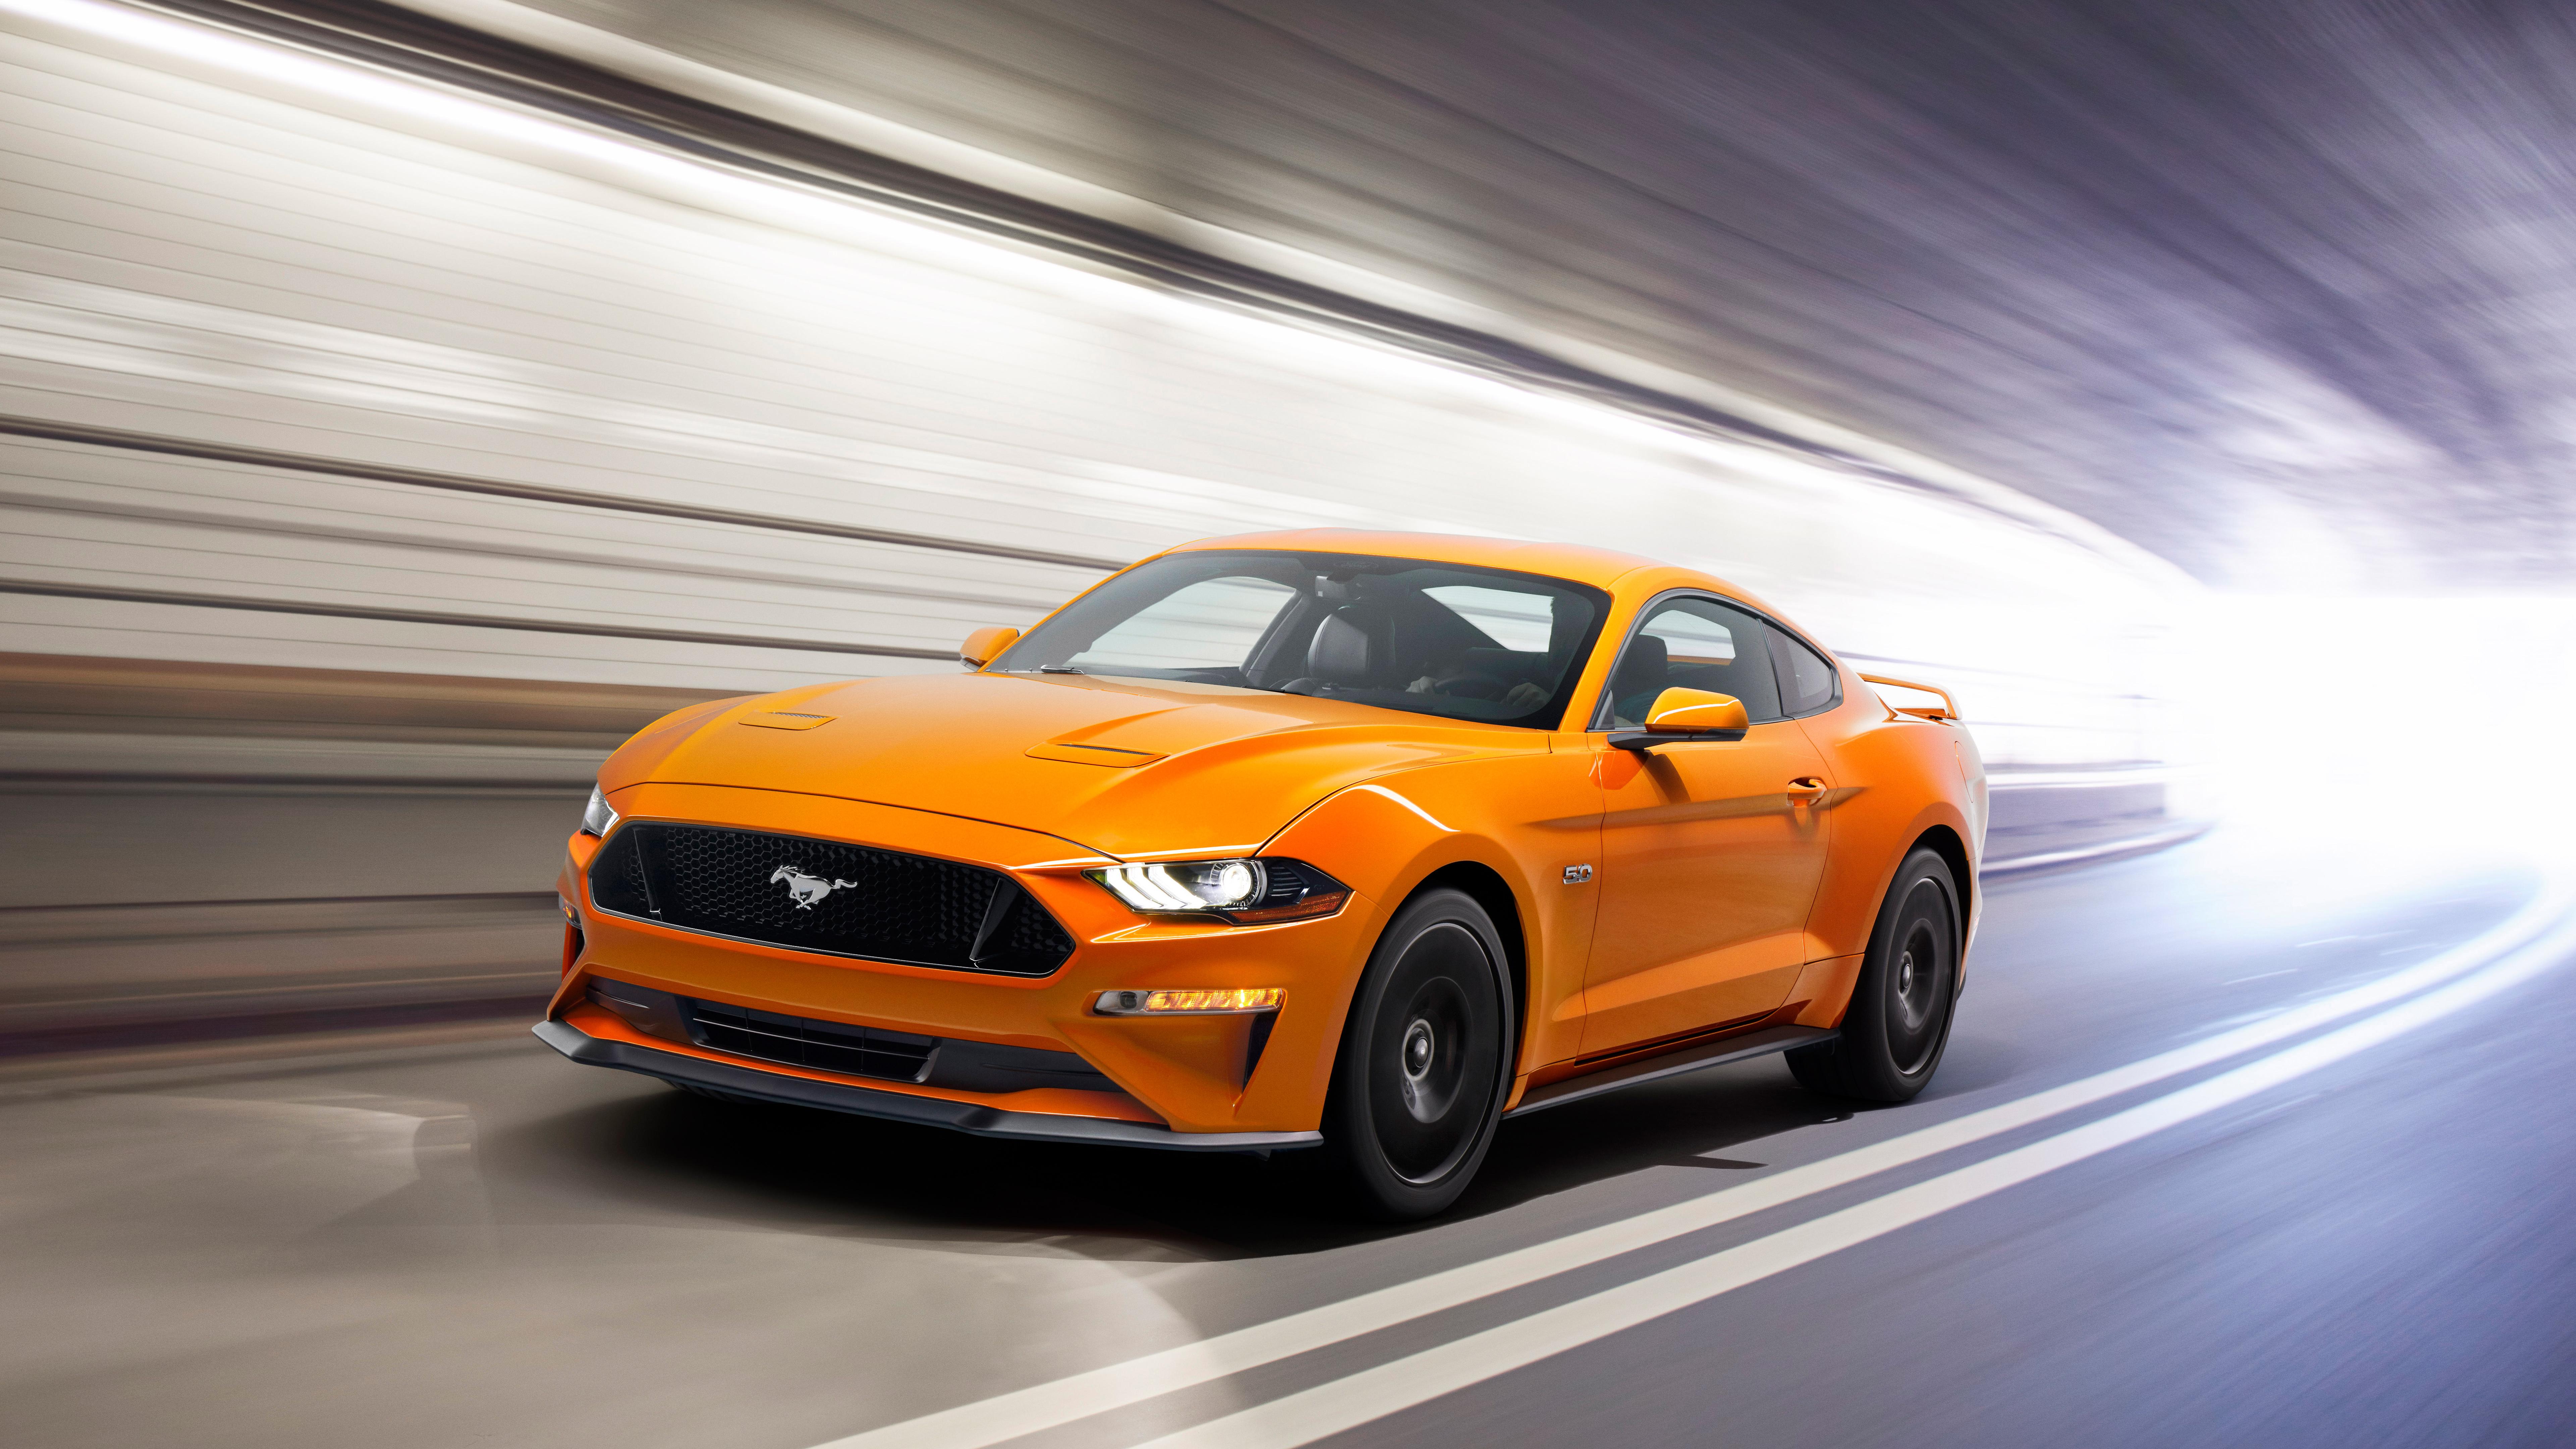 2018 Ford Mustang 4K 8K Wallpaper HD Car Wallpapers 7680x4320